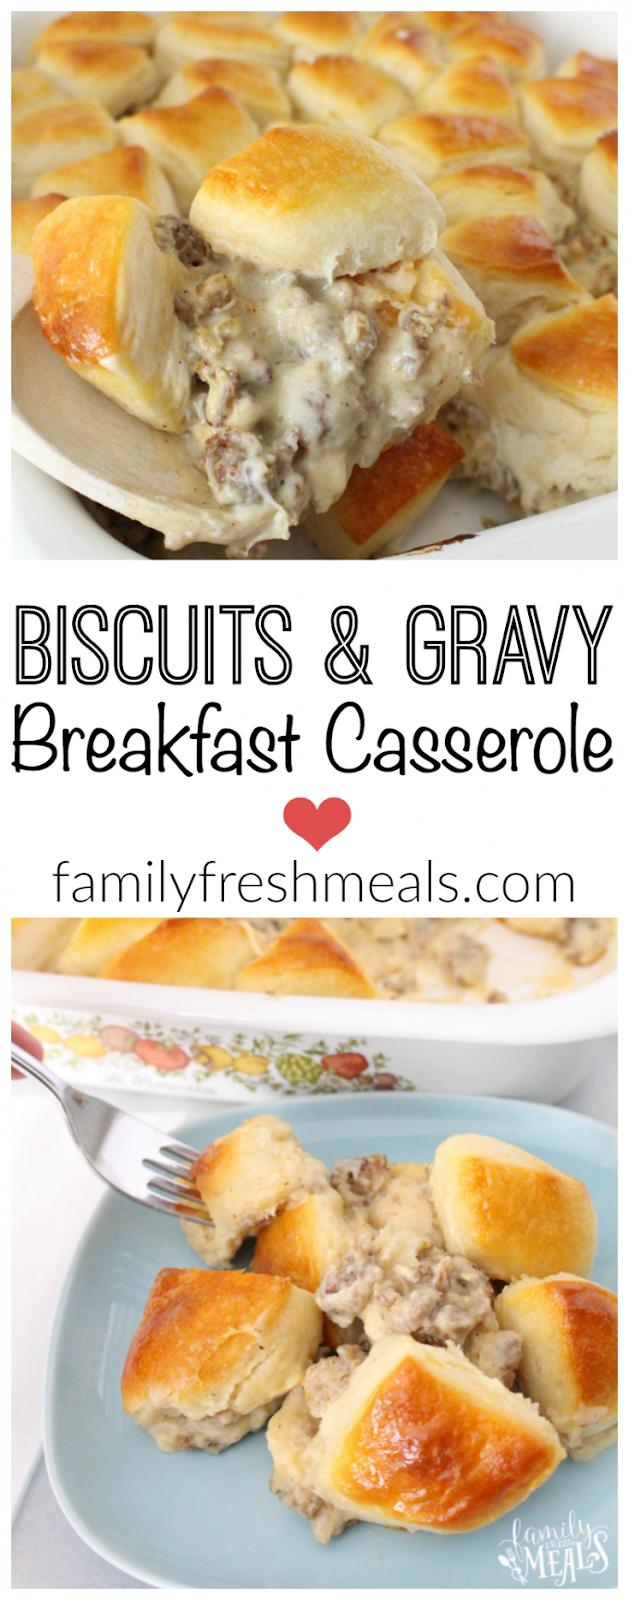 Biscuits and Gravy Breakfast Casserole Recipe